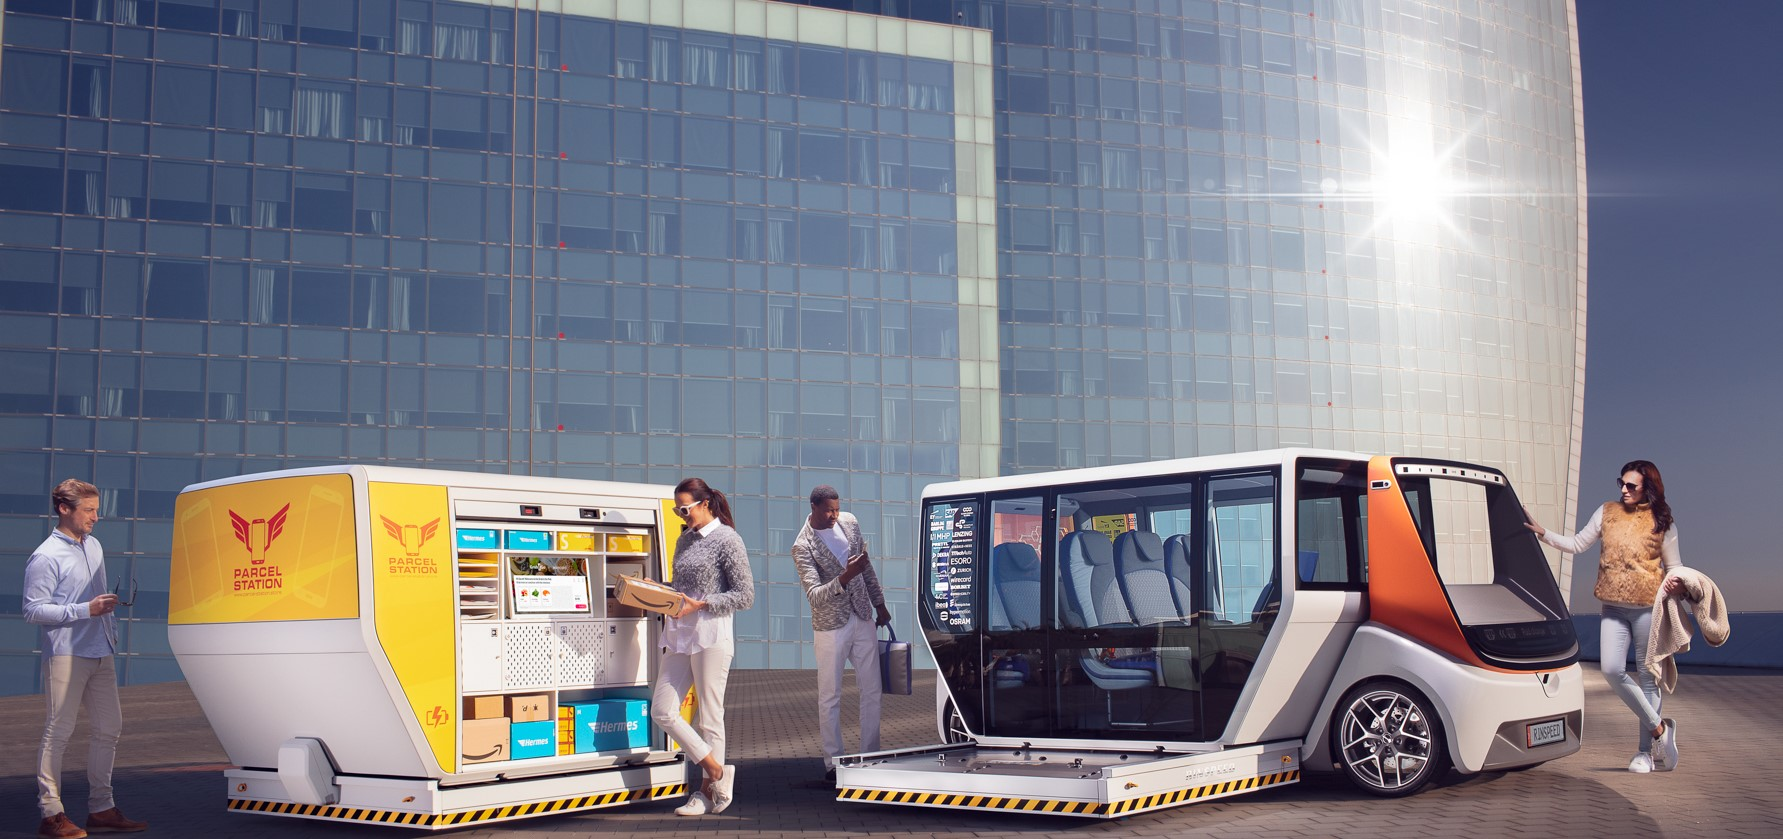 "CES Las Vegas 2020: Rinspeed's ""MetroSnap"" displays innovati"